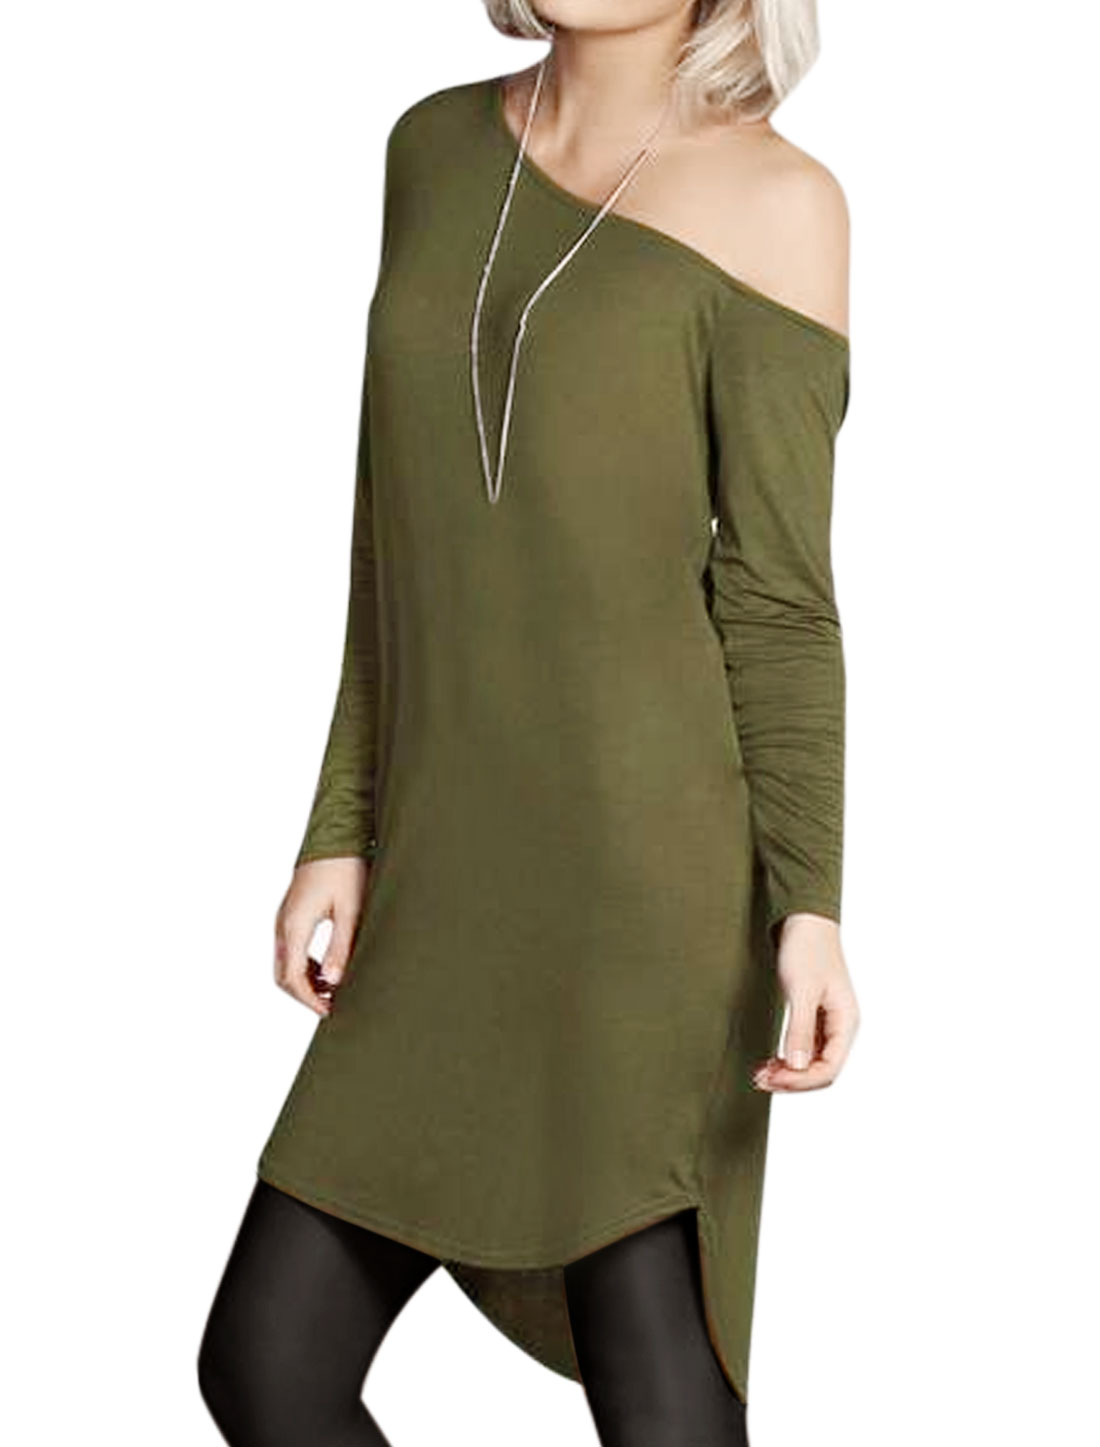 Lady Asymmetric Neck Curved Hem Tunic T-Shirt Green M